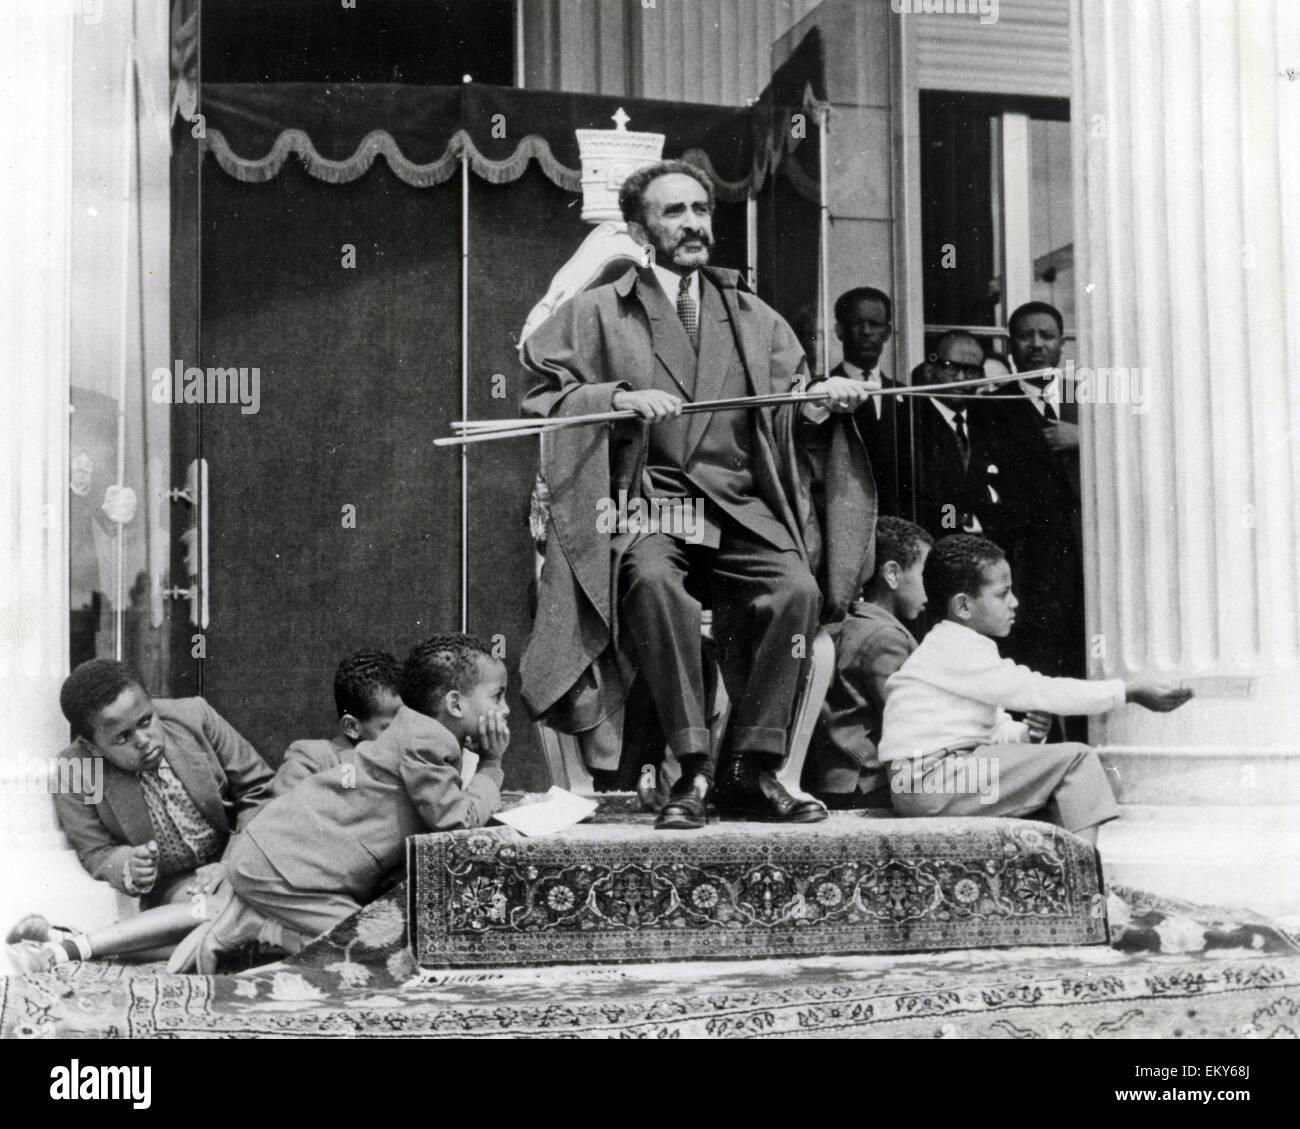 HAILE SELASSIE (1892-1975) Etheopian Regent about 1957 - Stock Image